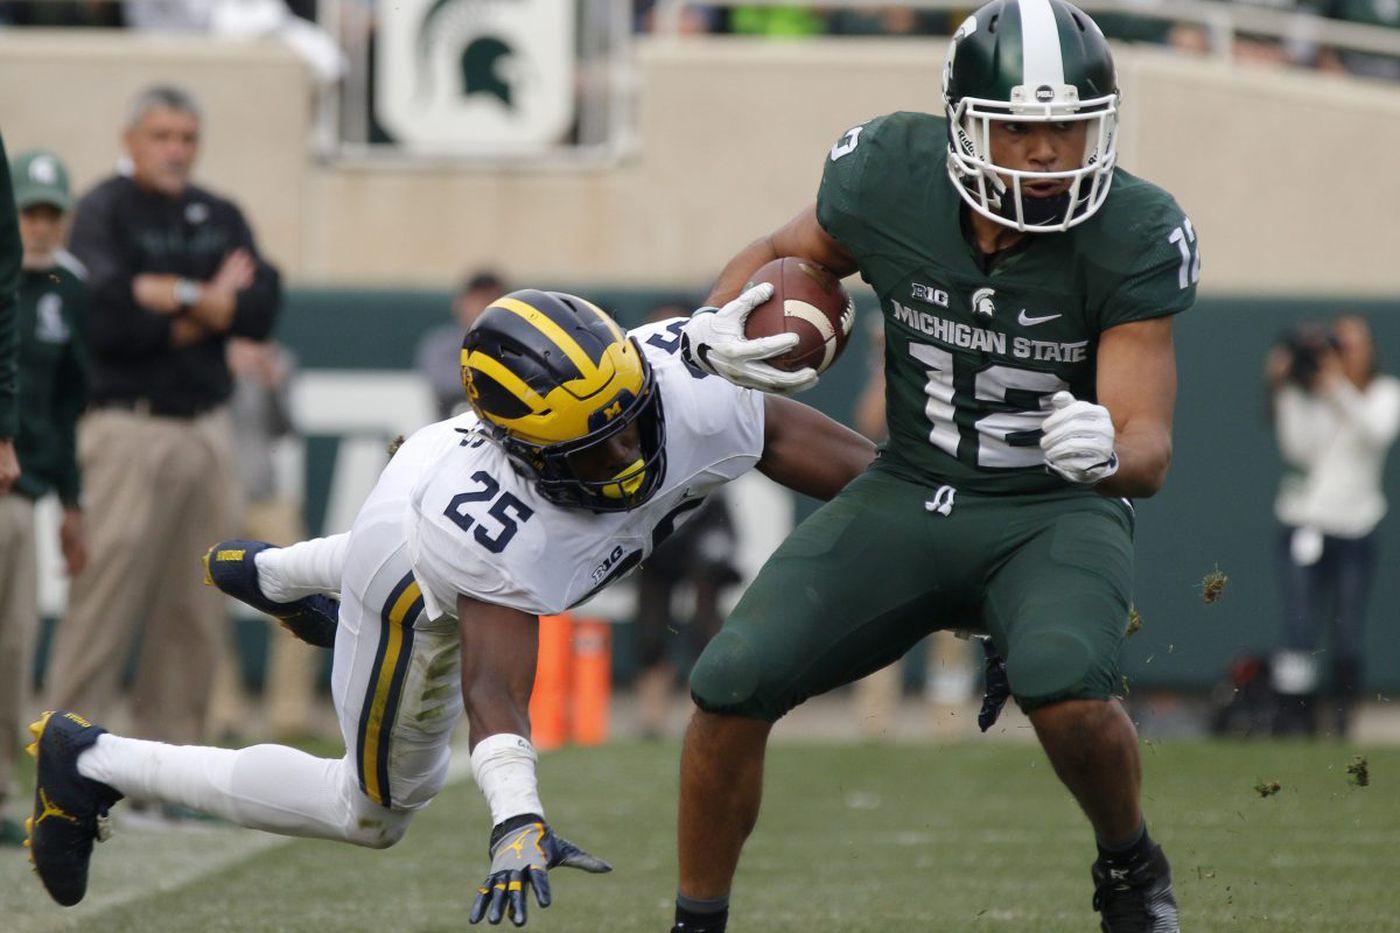 Michigan dismisses CB Nate Johnson; Rutgers healing | Big Ten Notes